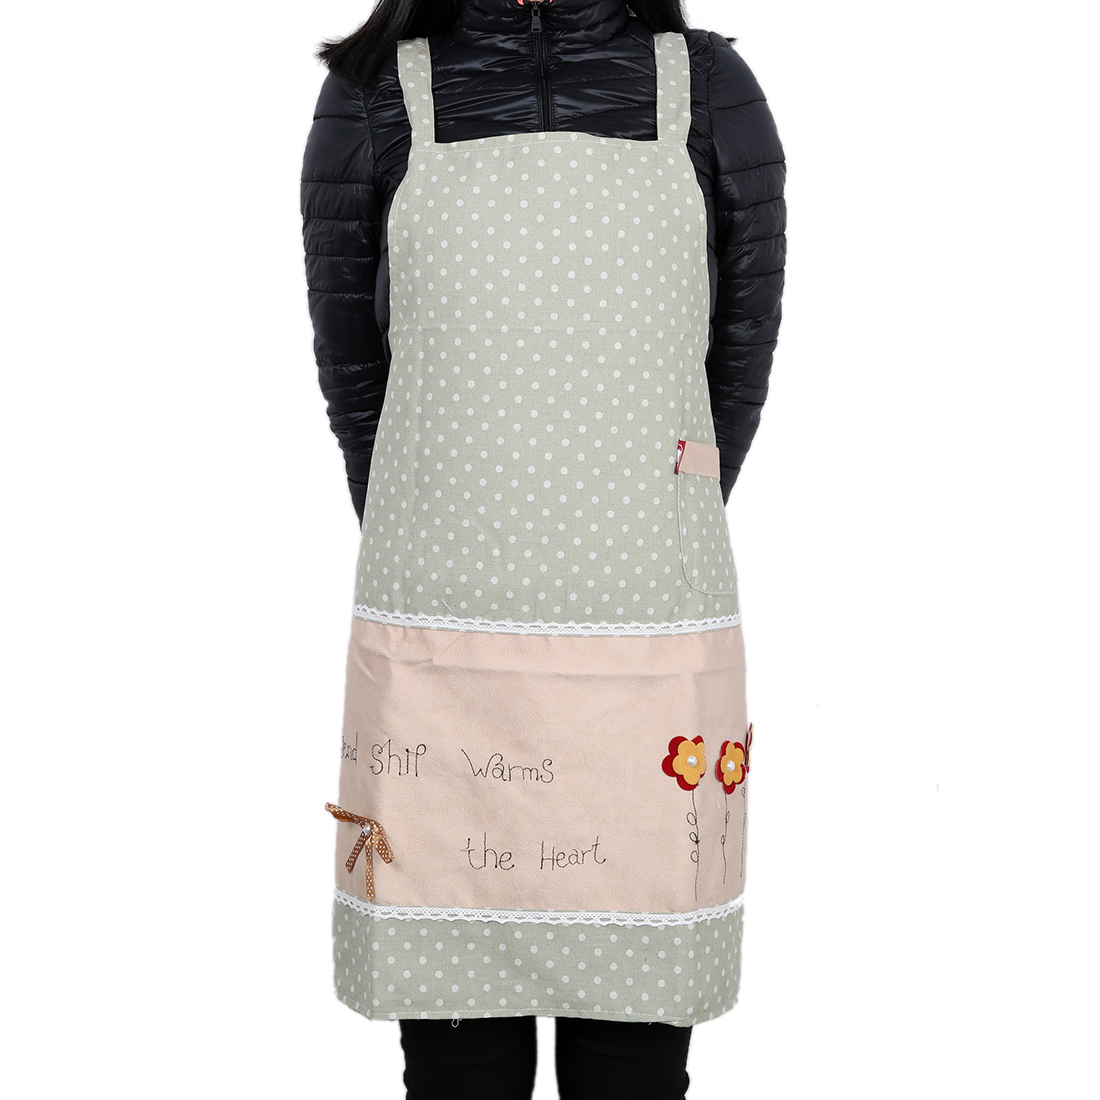 English Letter Dot Style Pocket Kitchen Apron for Lady